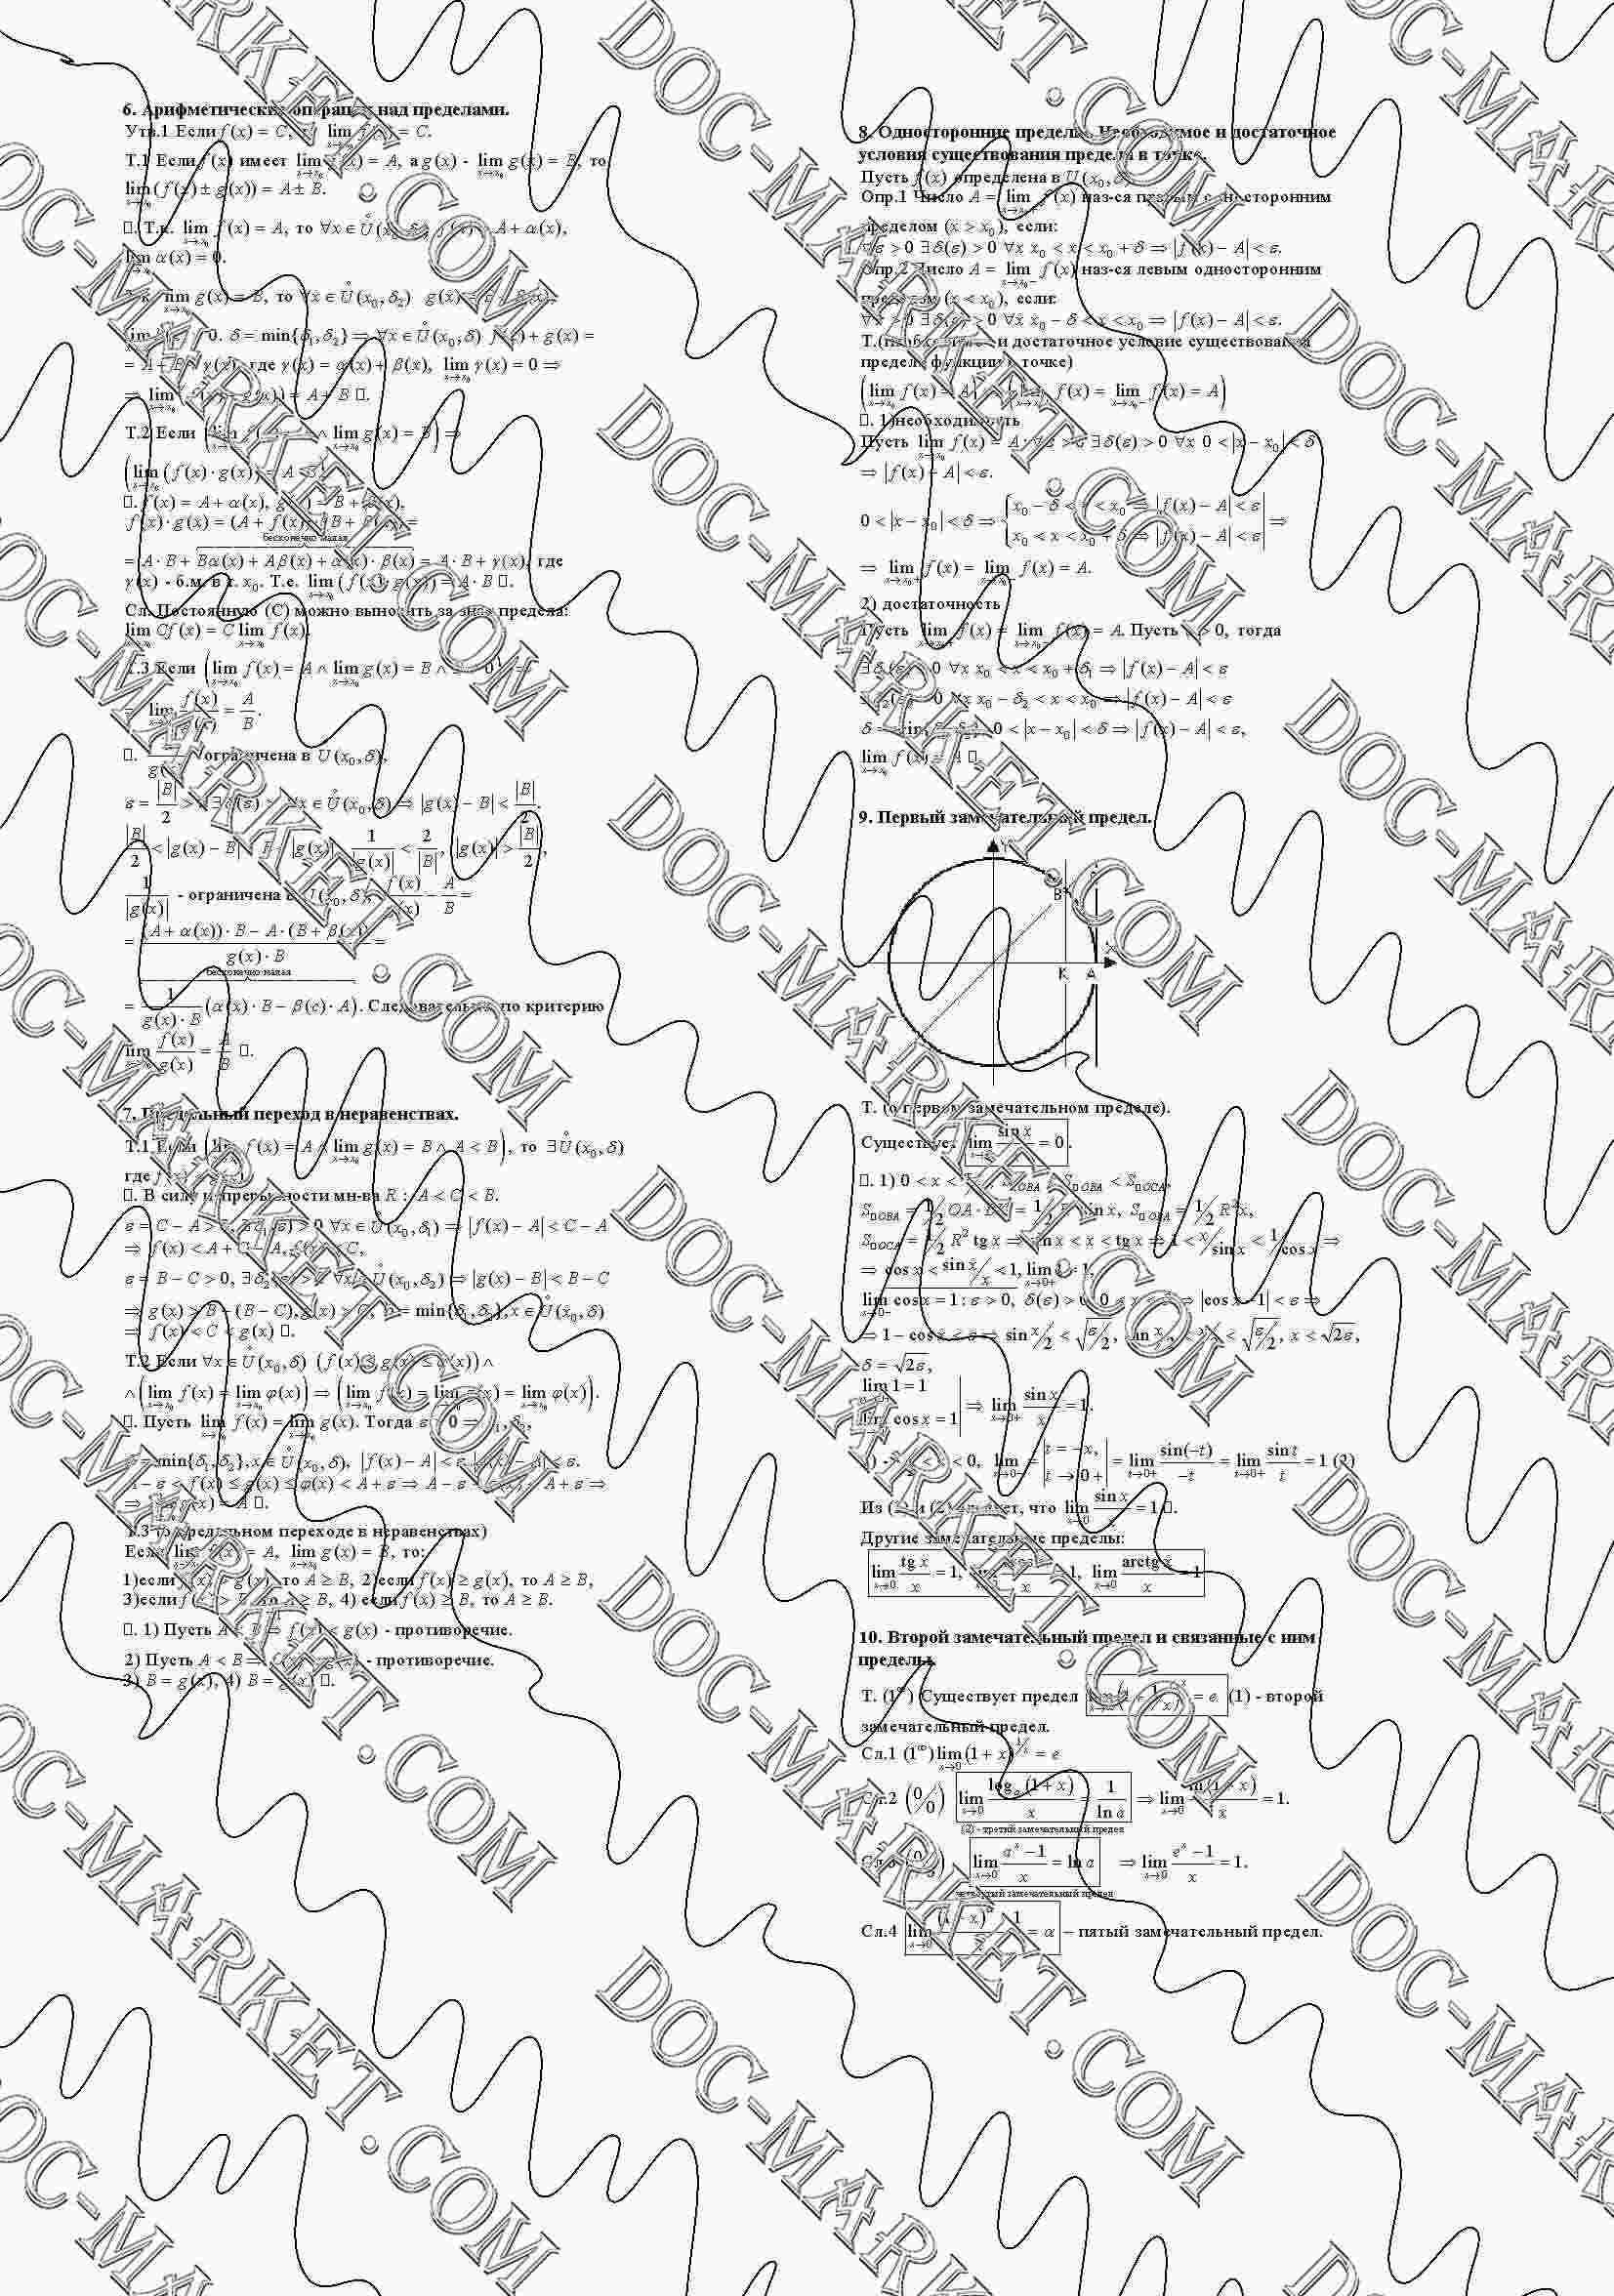 Шпаргалки Теория Вероятностей И Математическая Статистика